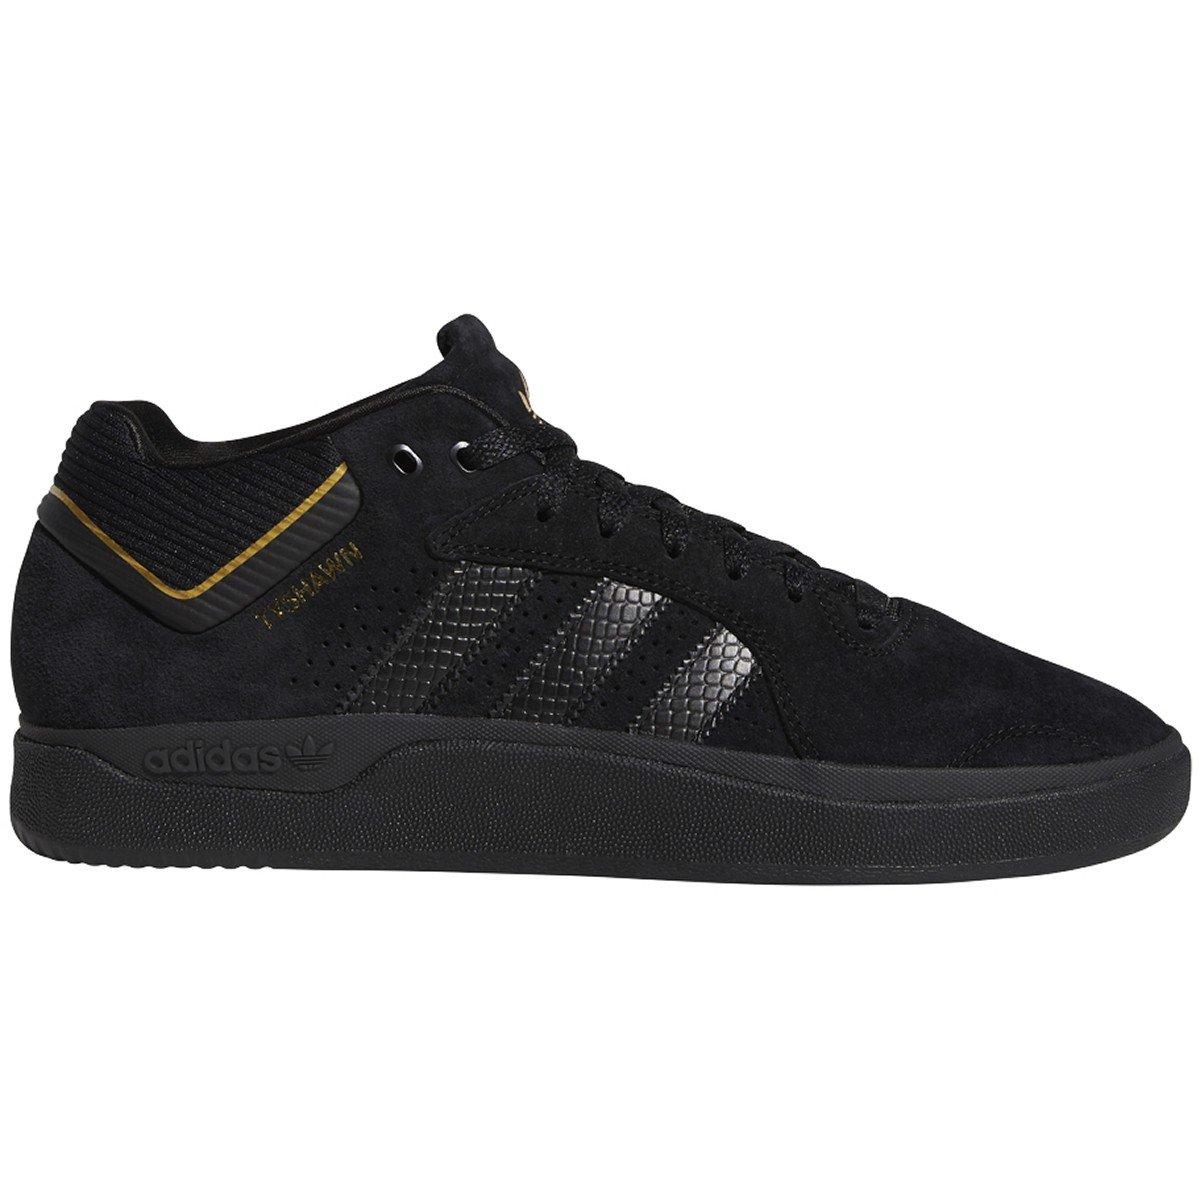 Adidas Tyshawn CORE BLACK/METALLIC GOLD